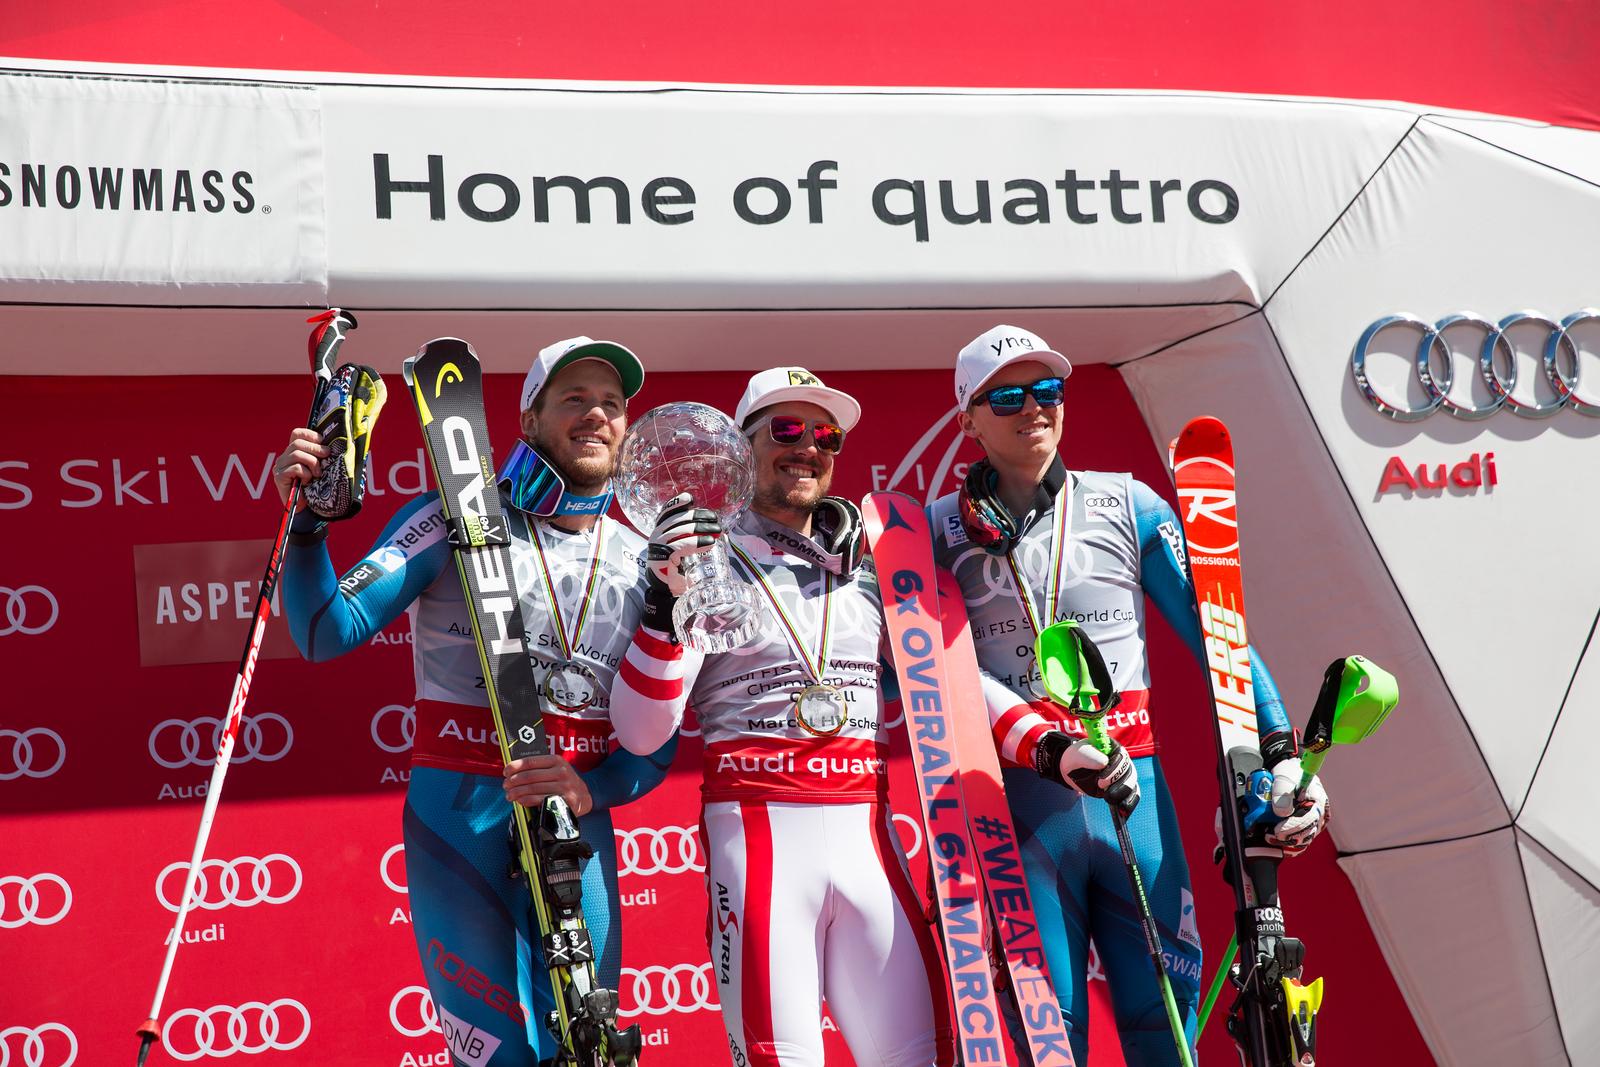 Kjetil Jansrud, Marcel HIrscher and Henrik Kristoffersen 2016-17 Alpine Overall World Cup Champion Crystal Globe 2017 Audi FIS Ski World Cup finals in Aspen, CO. Photo: U.S. Ski Team